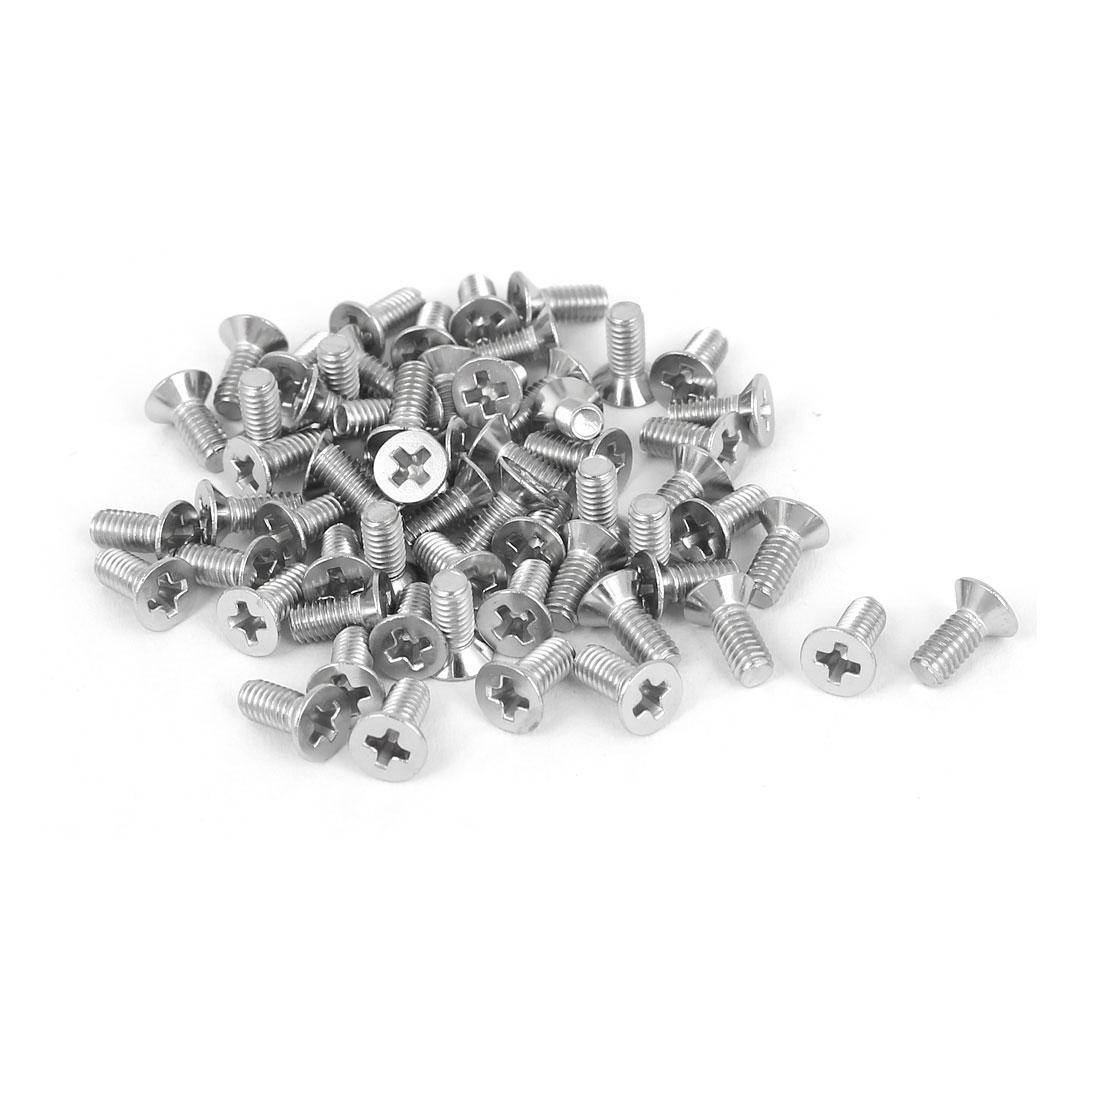 60 Pcs M2.5x6mm 316 Stainless Steel Flat Head Phillips Machine Screws Bolts